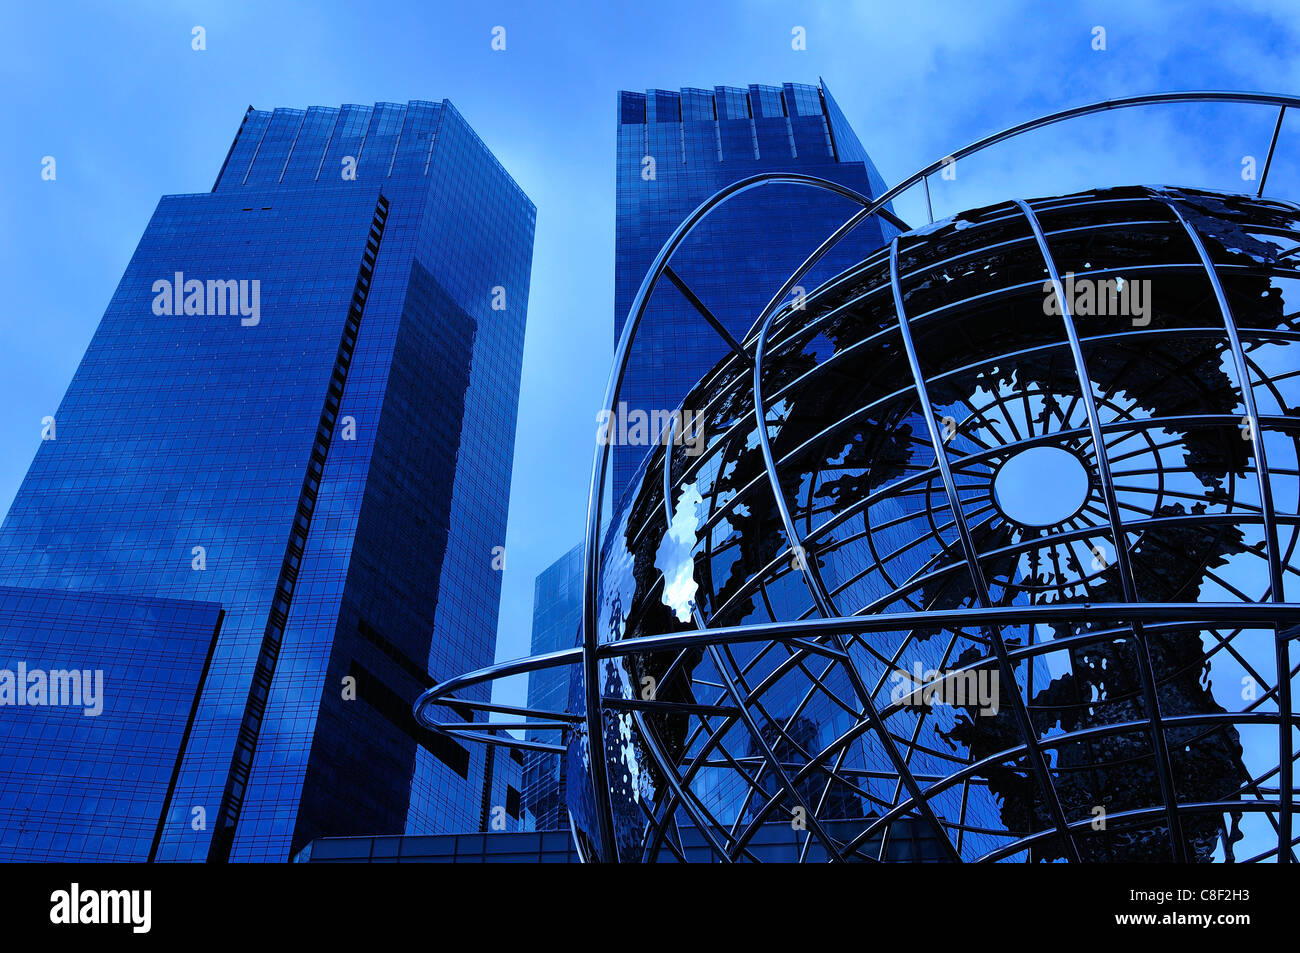 Time Warner Center, Columbus Circle, Manhattan, New York, USA, United States, America, sculpture, night - Stock Image